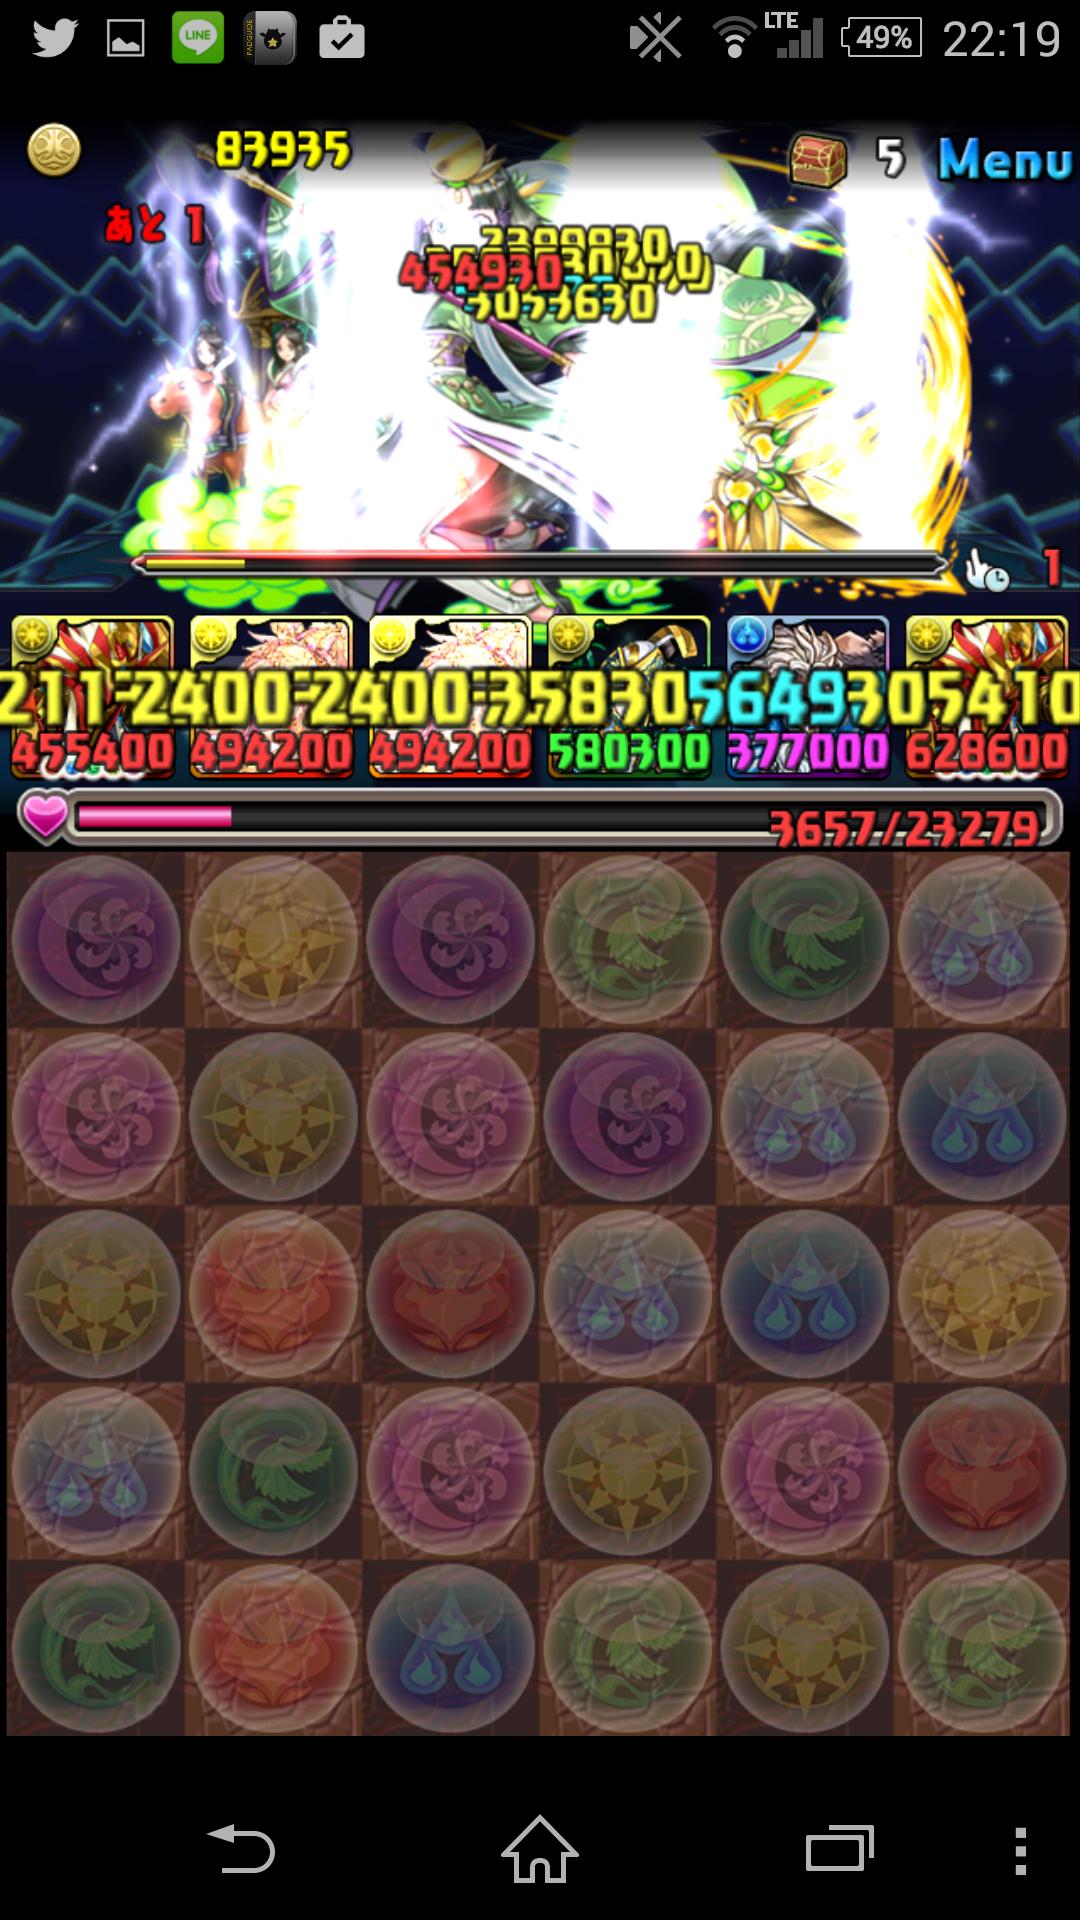 Screenshot_2015-04-12-22-20-00.png